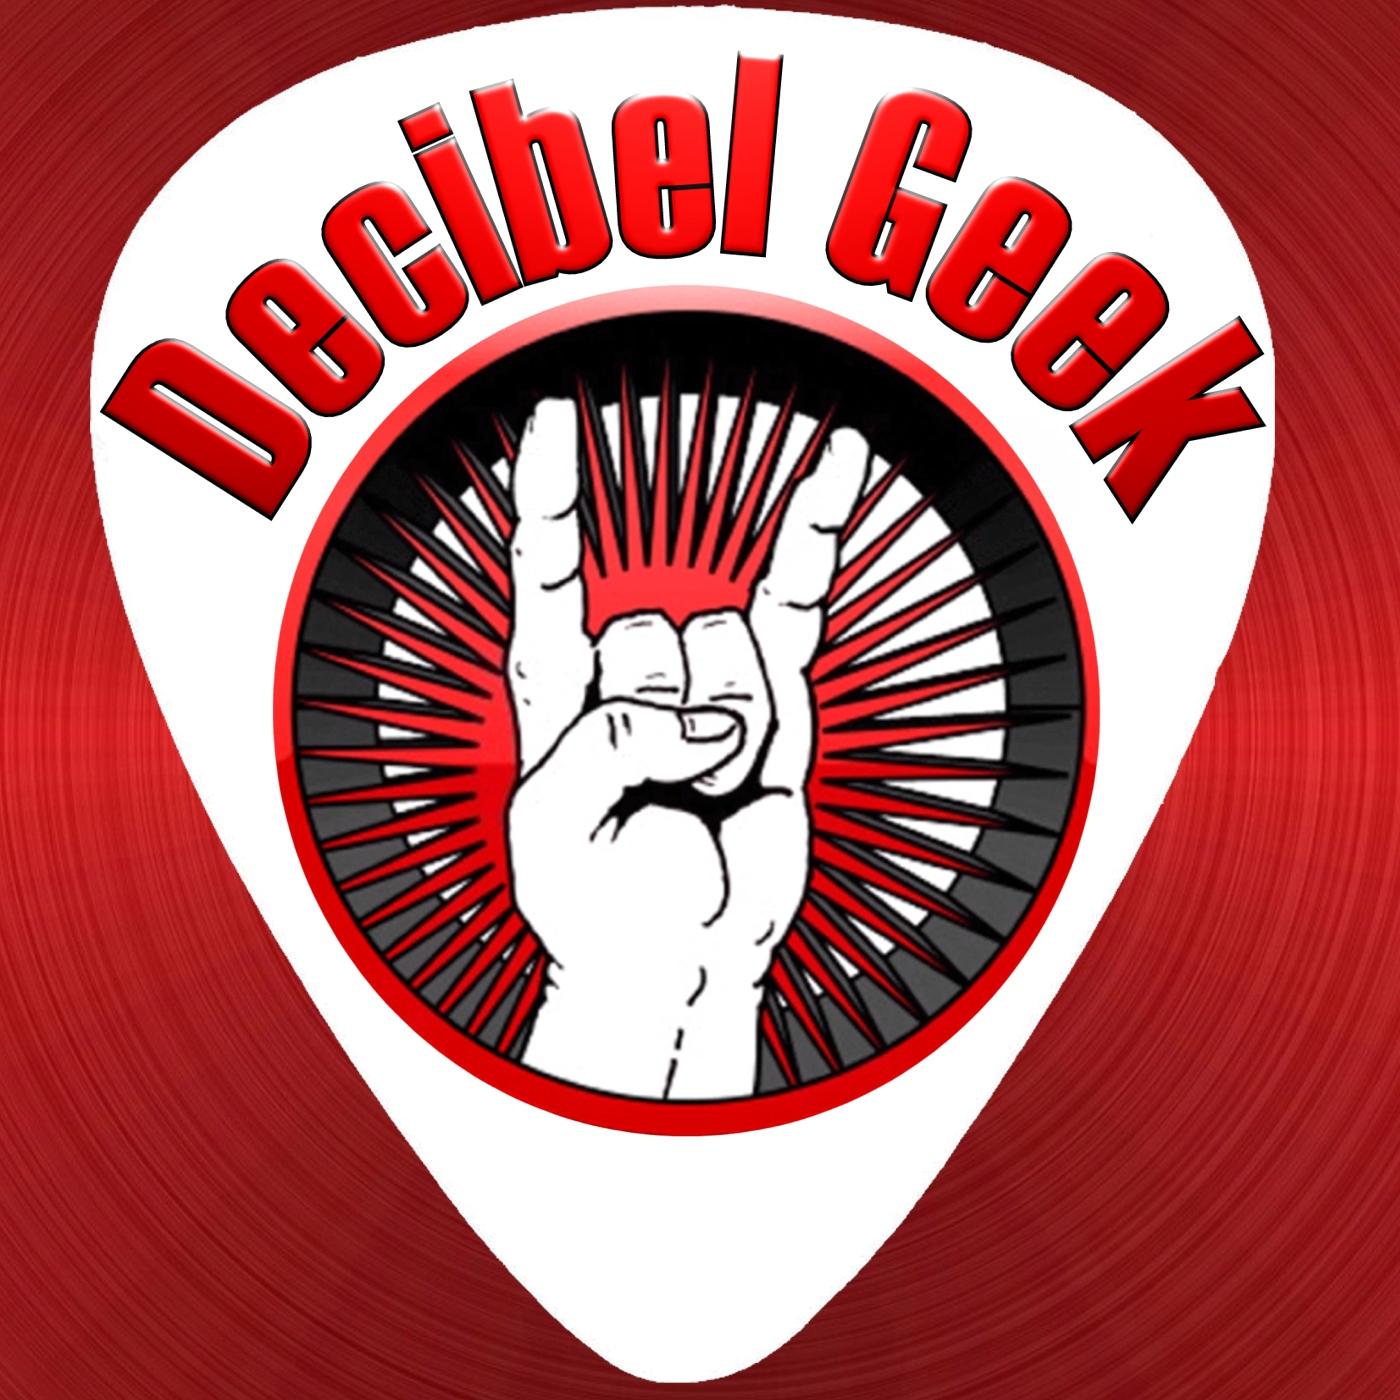 94455956e70 Decibel Geek Podcast - PodcastBlaster Podcast Directory